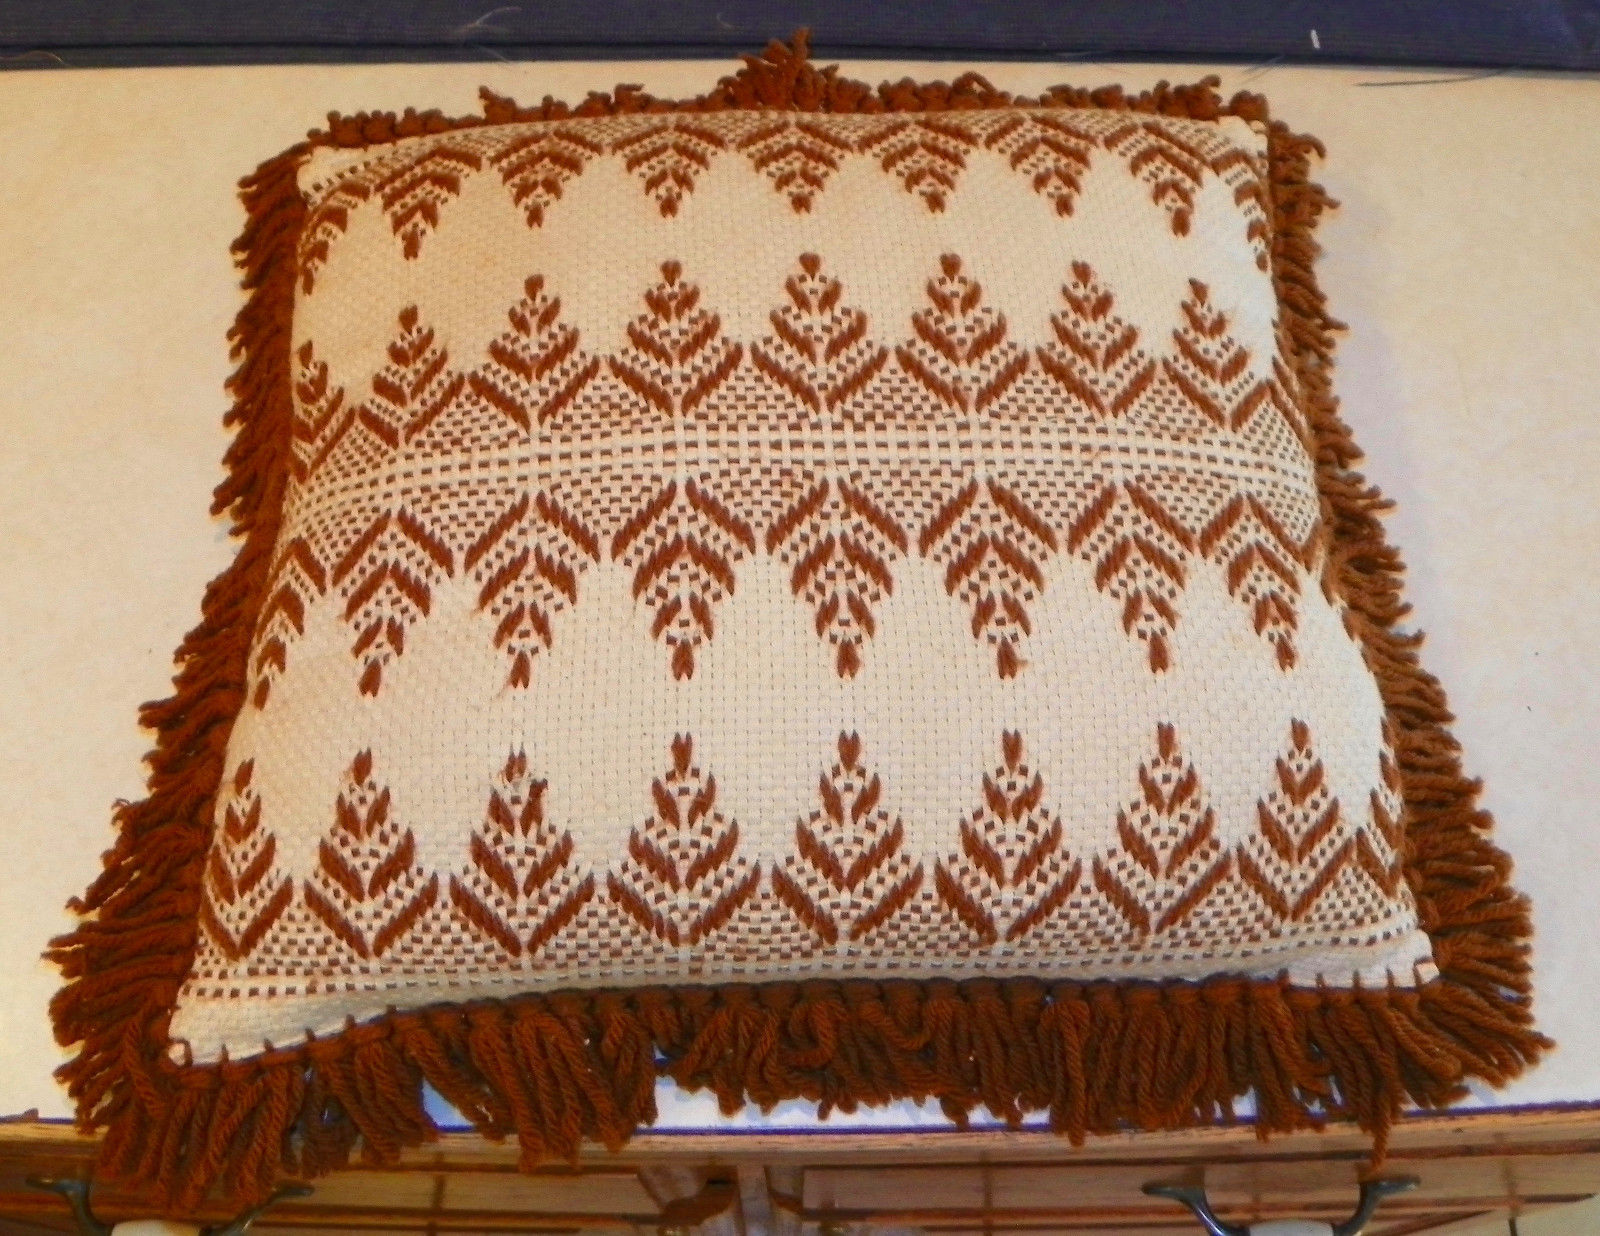 Brown Beige Print Latch Hook Decorative Pillow  16 x 16 - $39.95